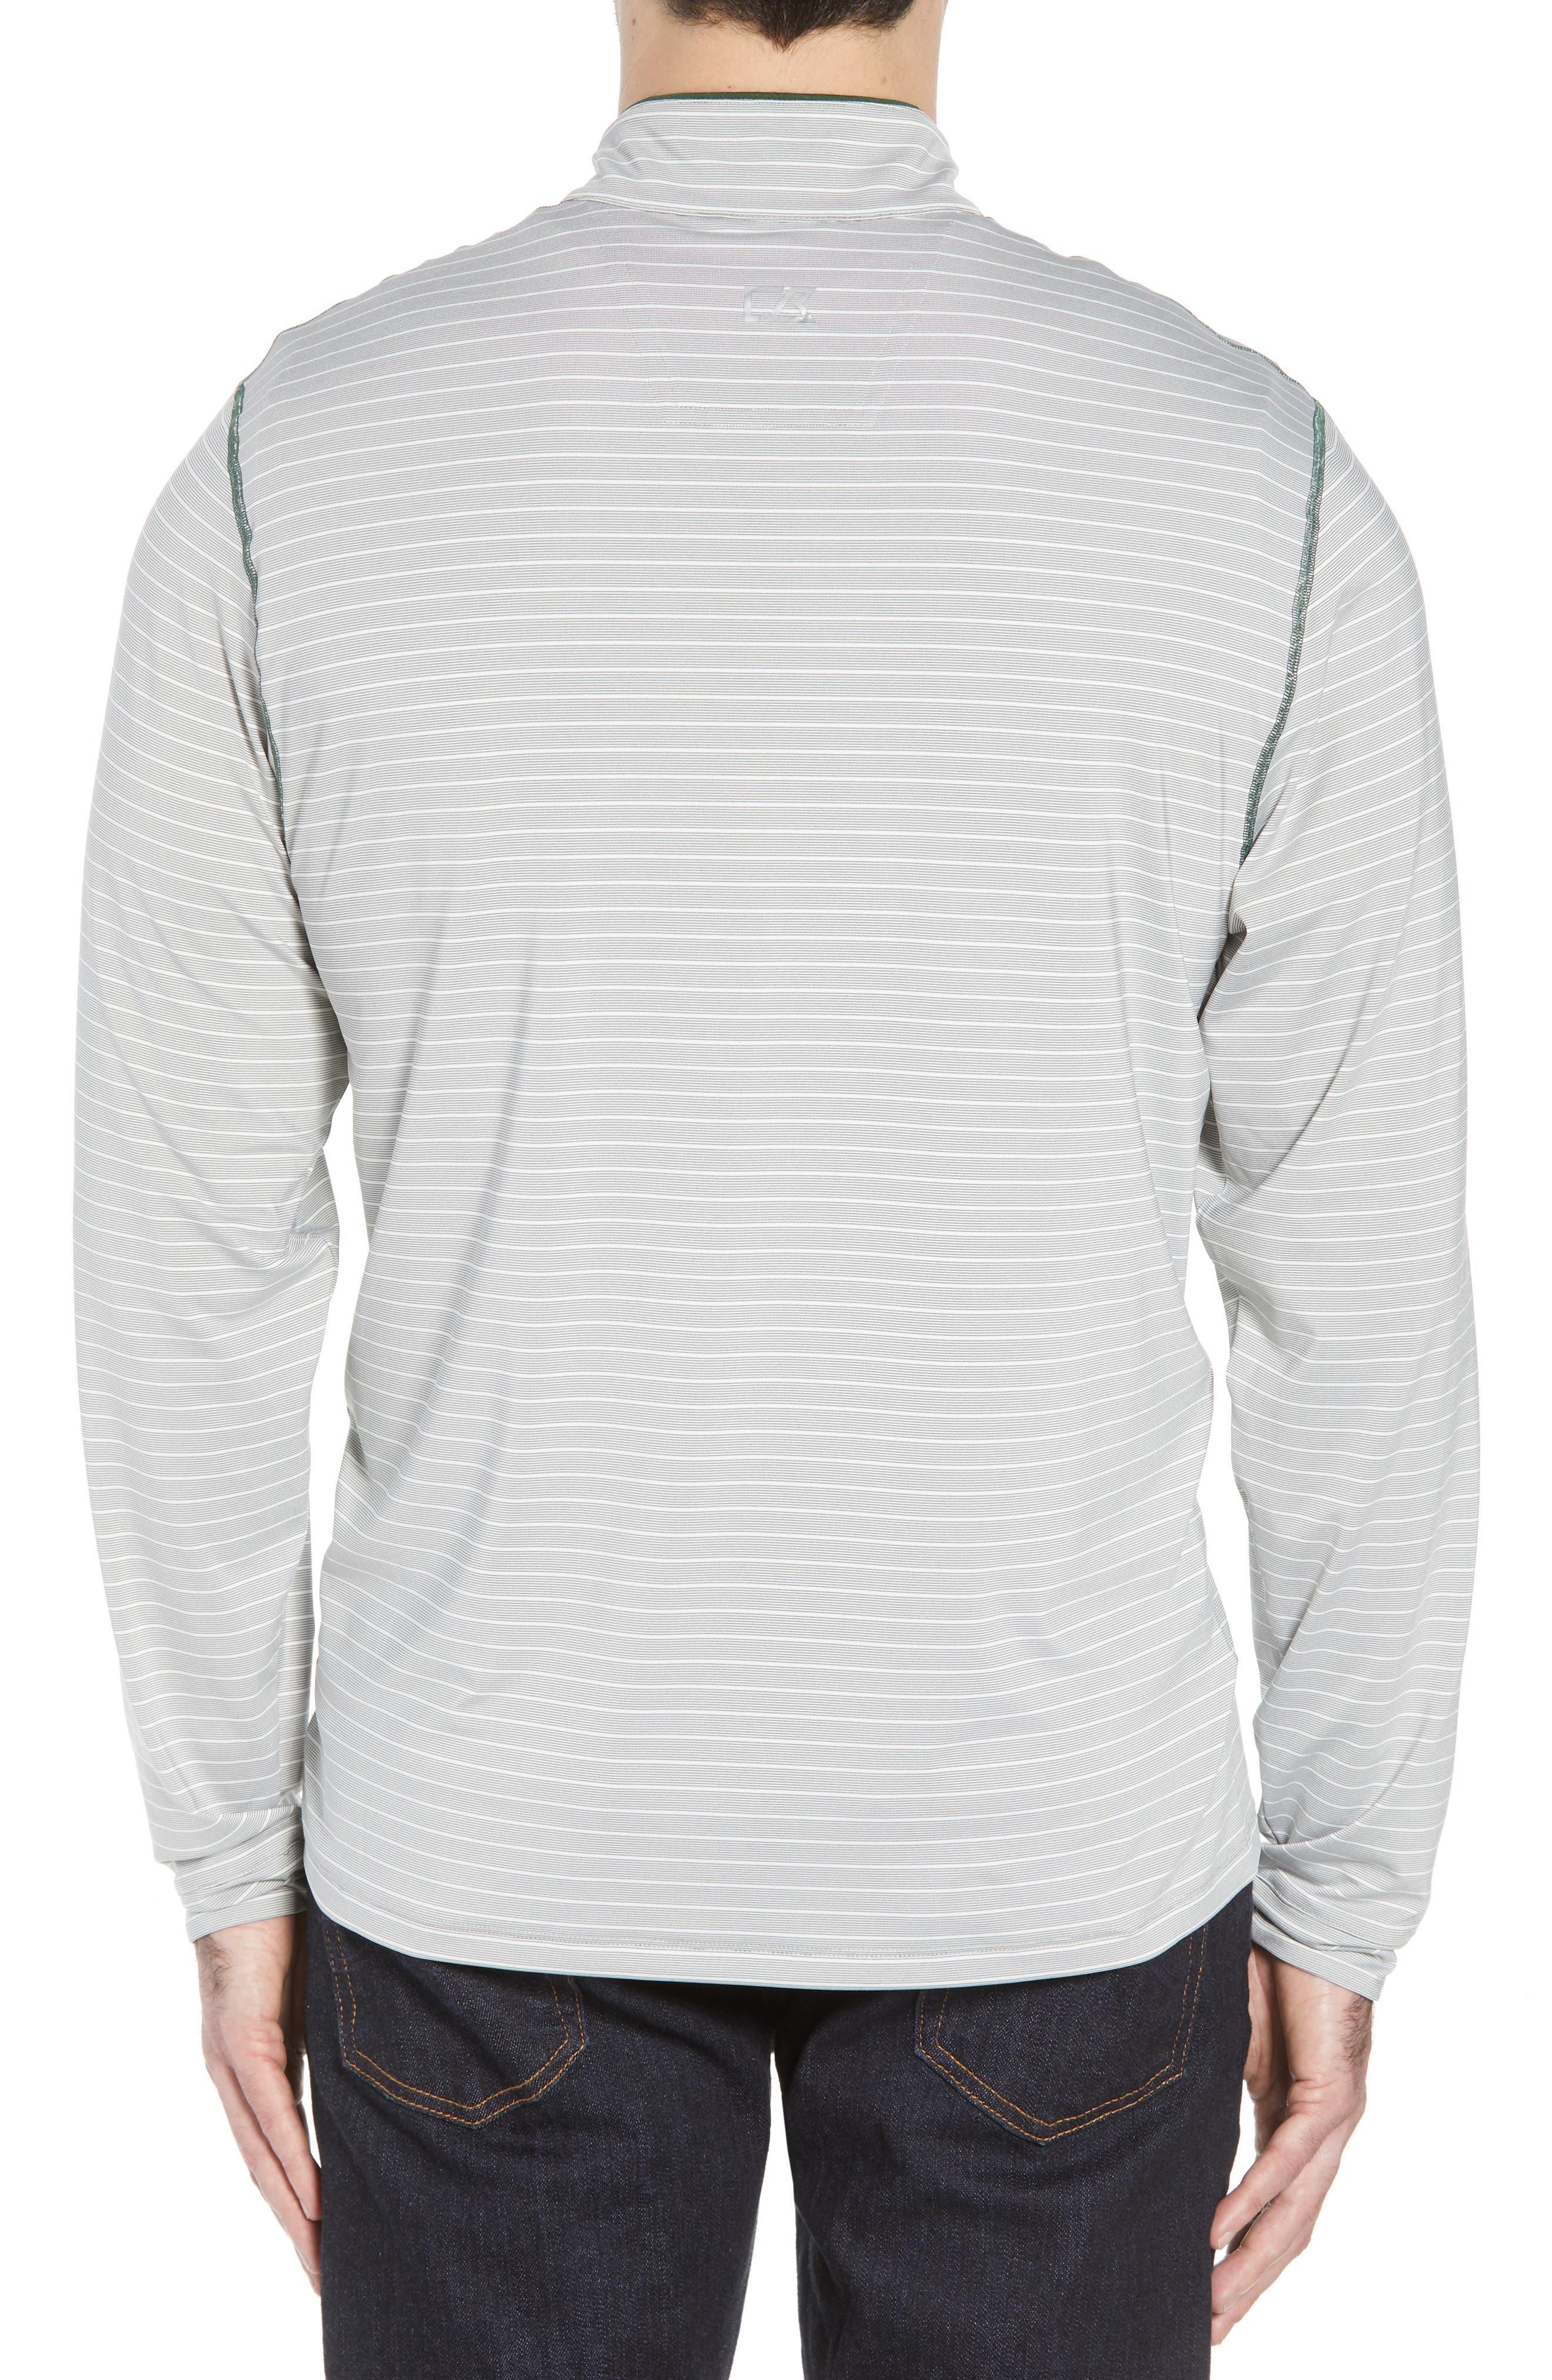 Meridian - Philadelphia Eagles Regular Fit Half Zip Pullover,                             Alternate thumbnail 2, color,                             377